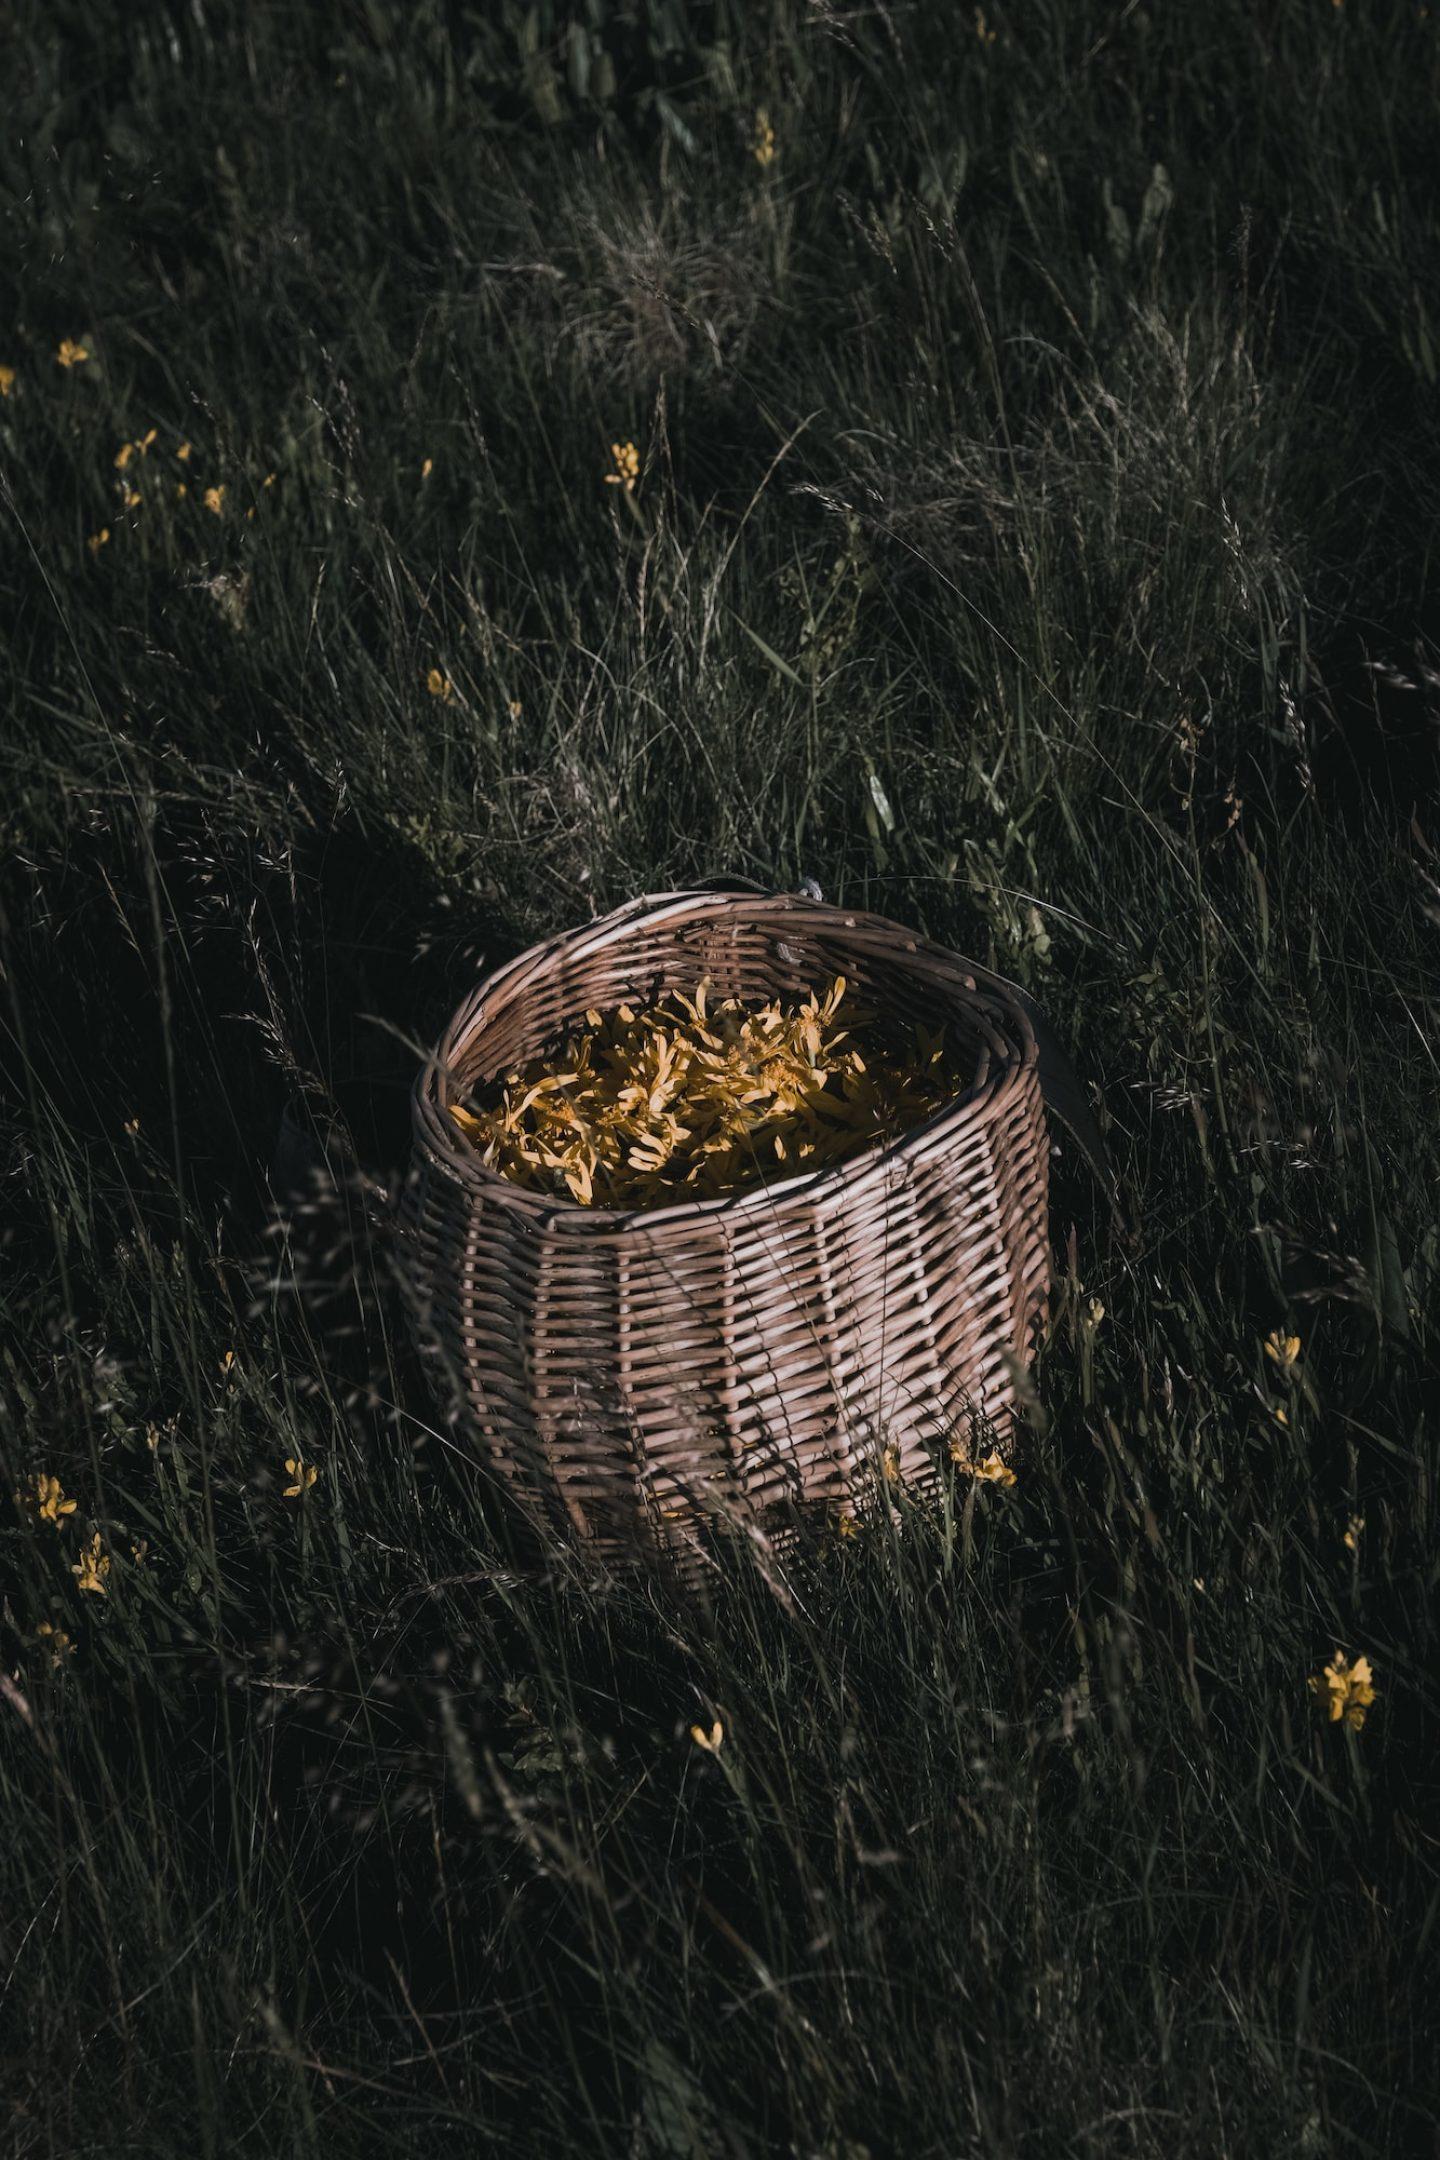 IGNANT-Dr-Hauschka-Wild-Plant-Harvest-Clemens-Poloczek-028